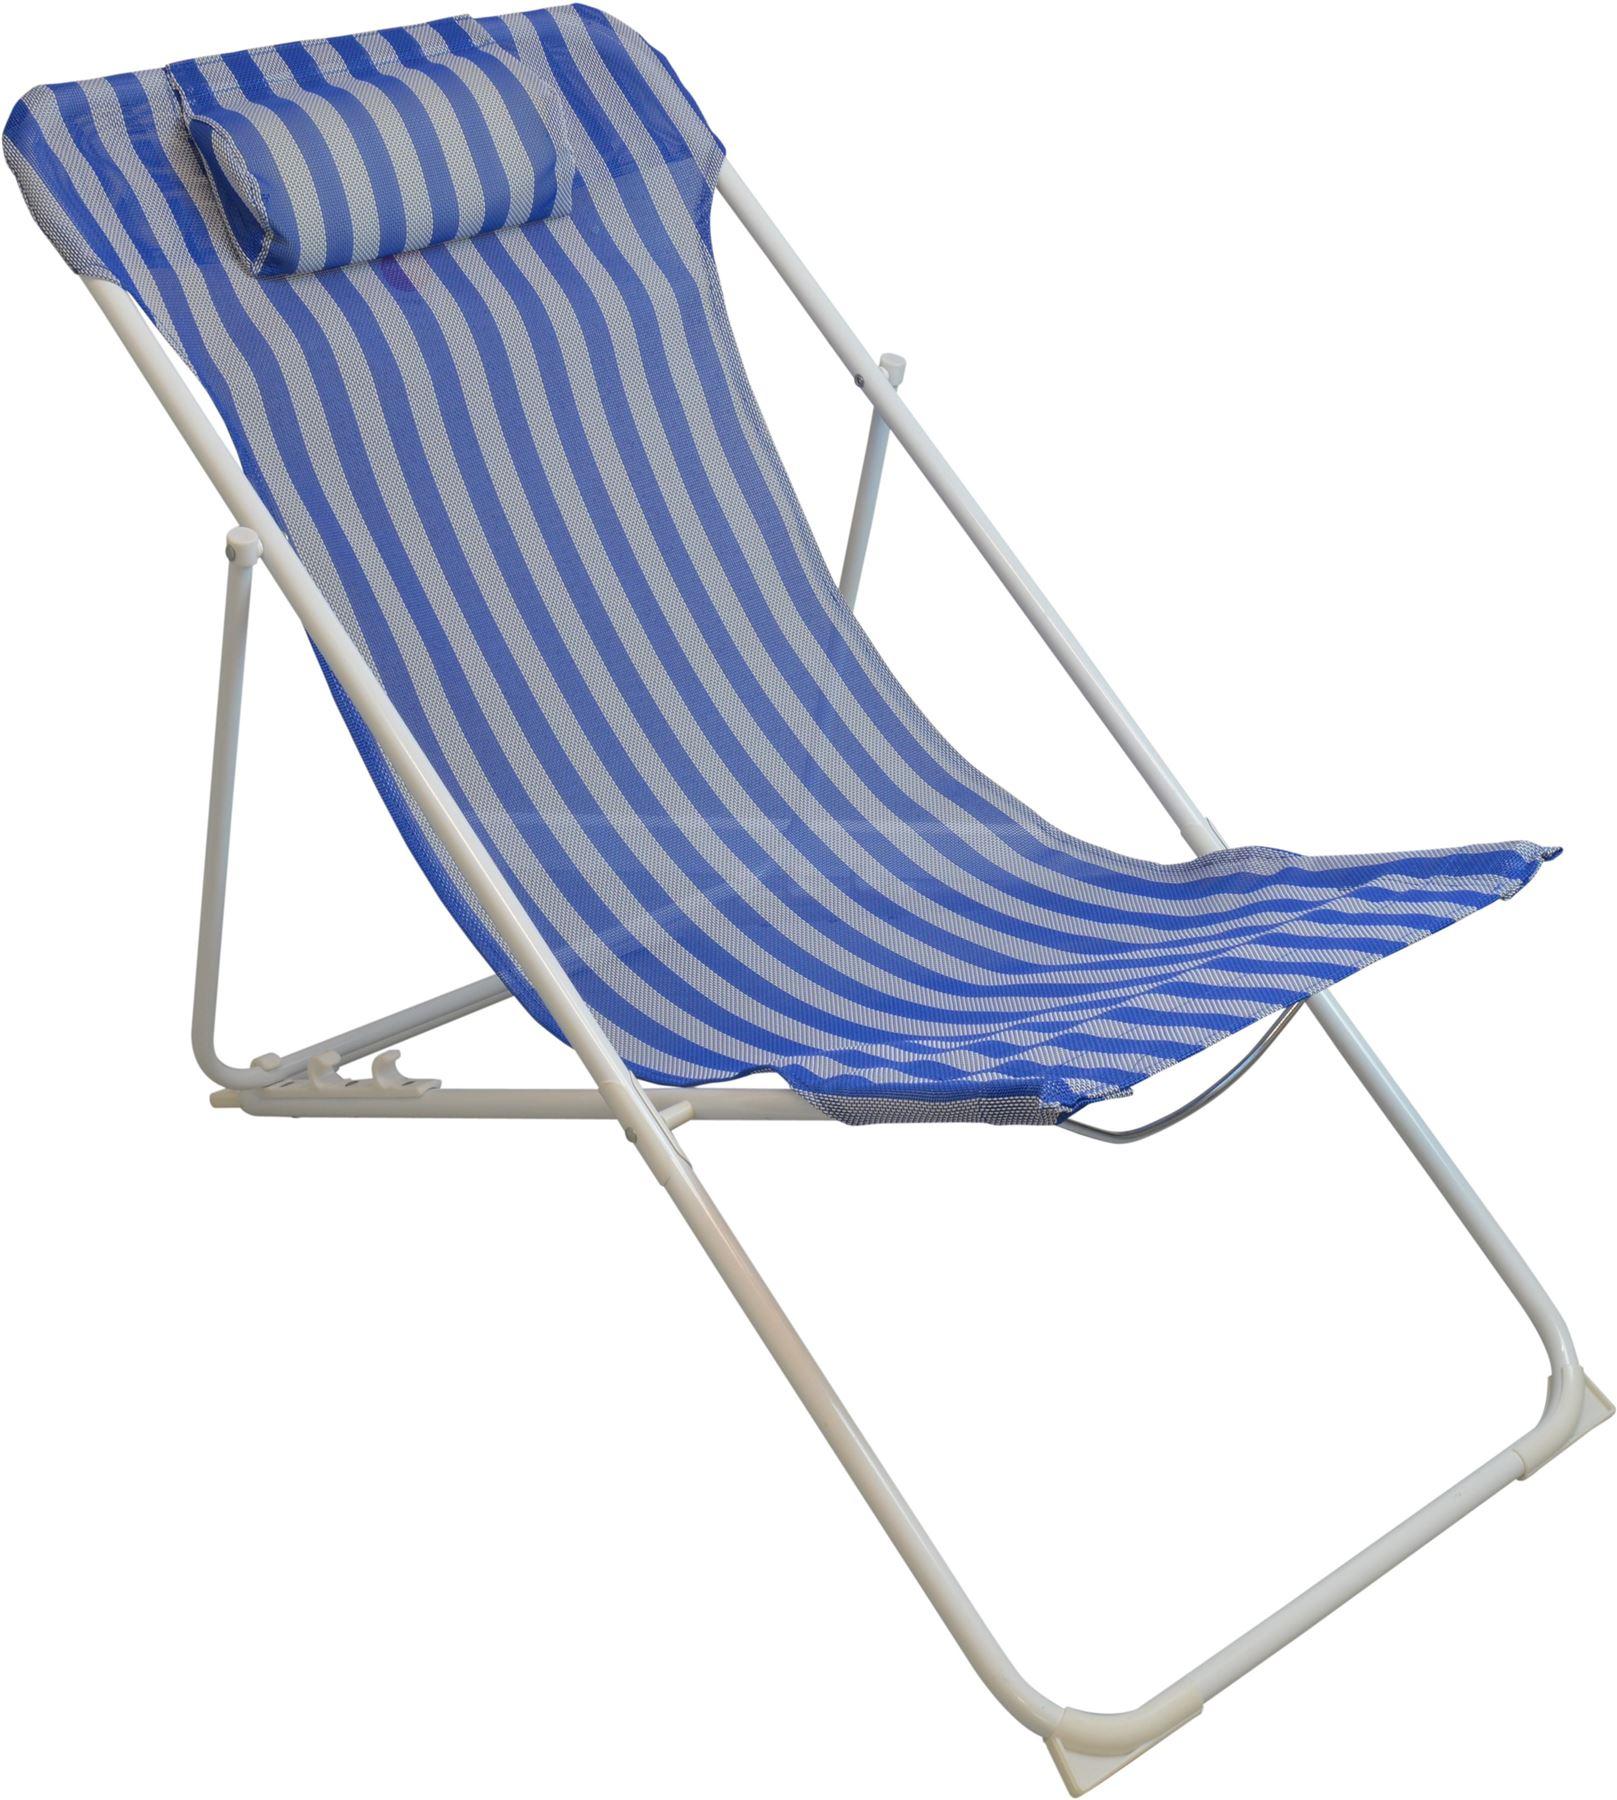 blue metal folding chairs tablecloths chair covers and sashes deckchair garden beach seaside deck